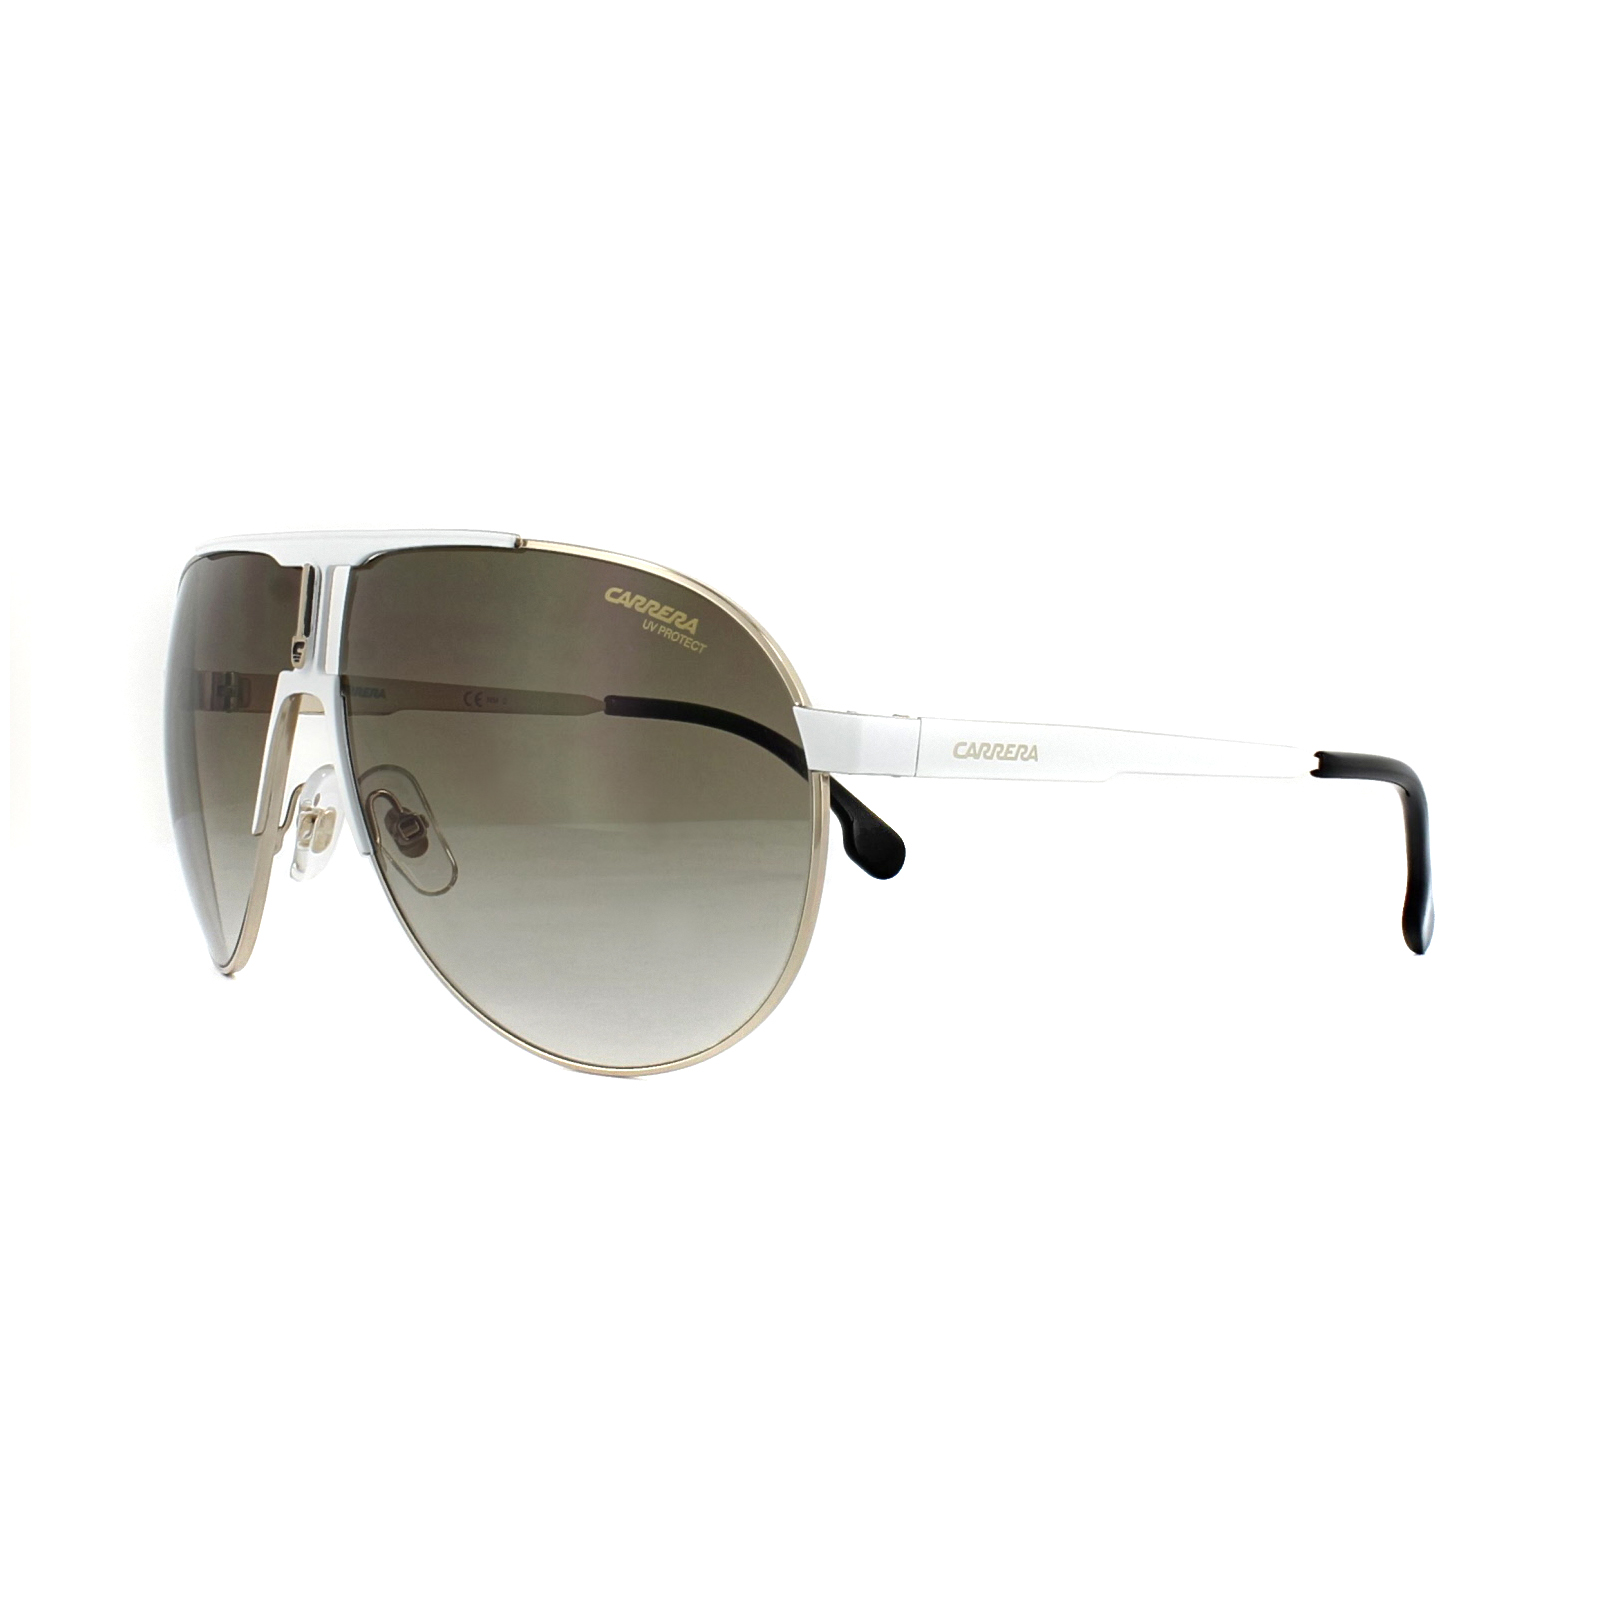 Cheap Carrera 1005 S Sunglasses - Discounted Sunglasses 241384a0fc8